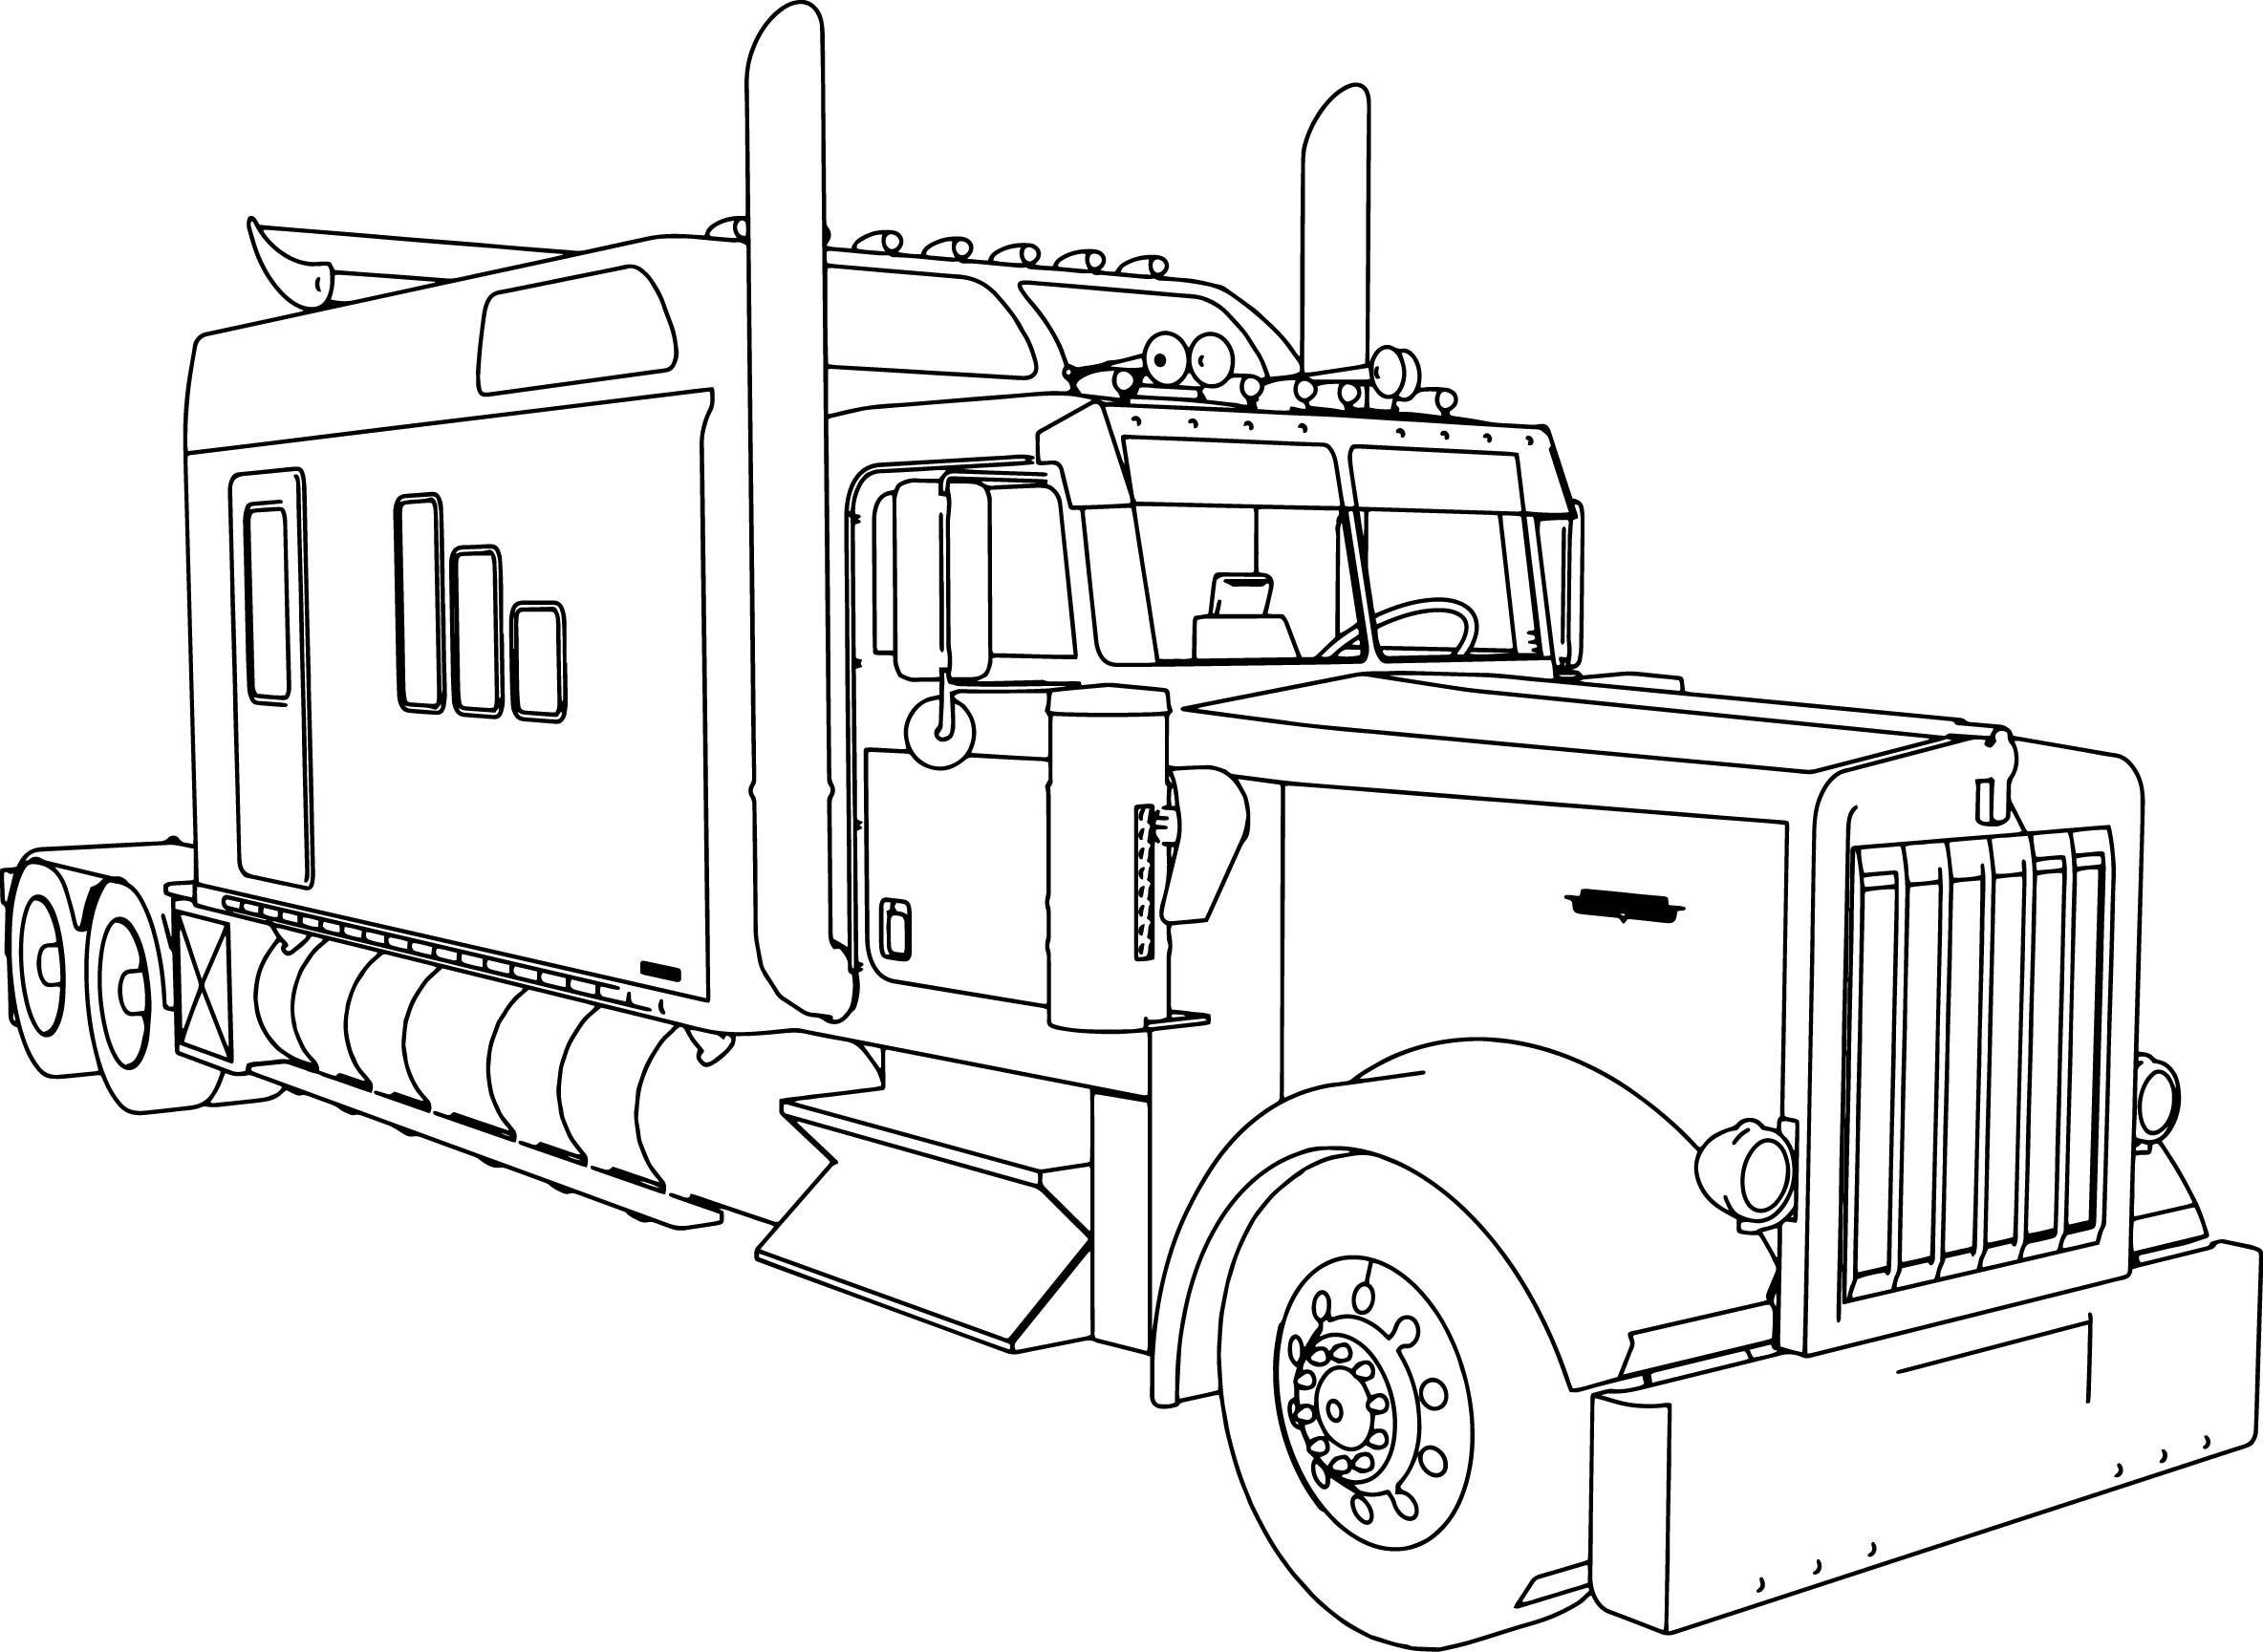 Peterbilt Semi Truck Coloring Page Drawing Sketch Sketch Coloring Page Truck Coloring Pages Monster Truck Coloring Pages Big Trucks